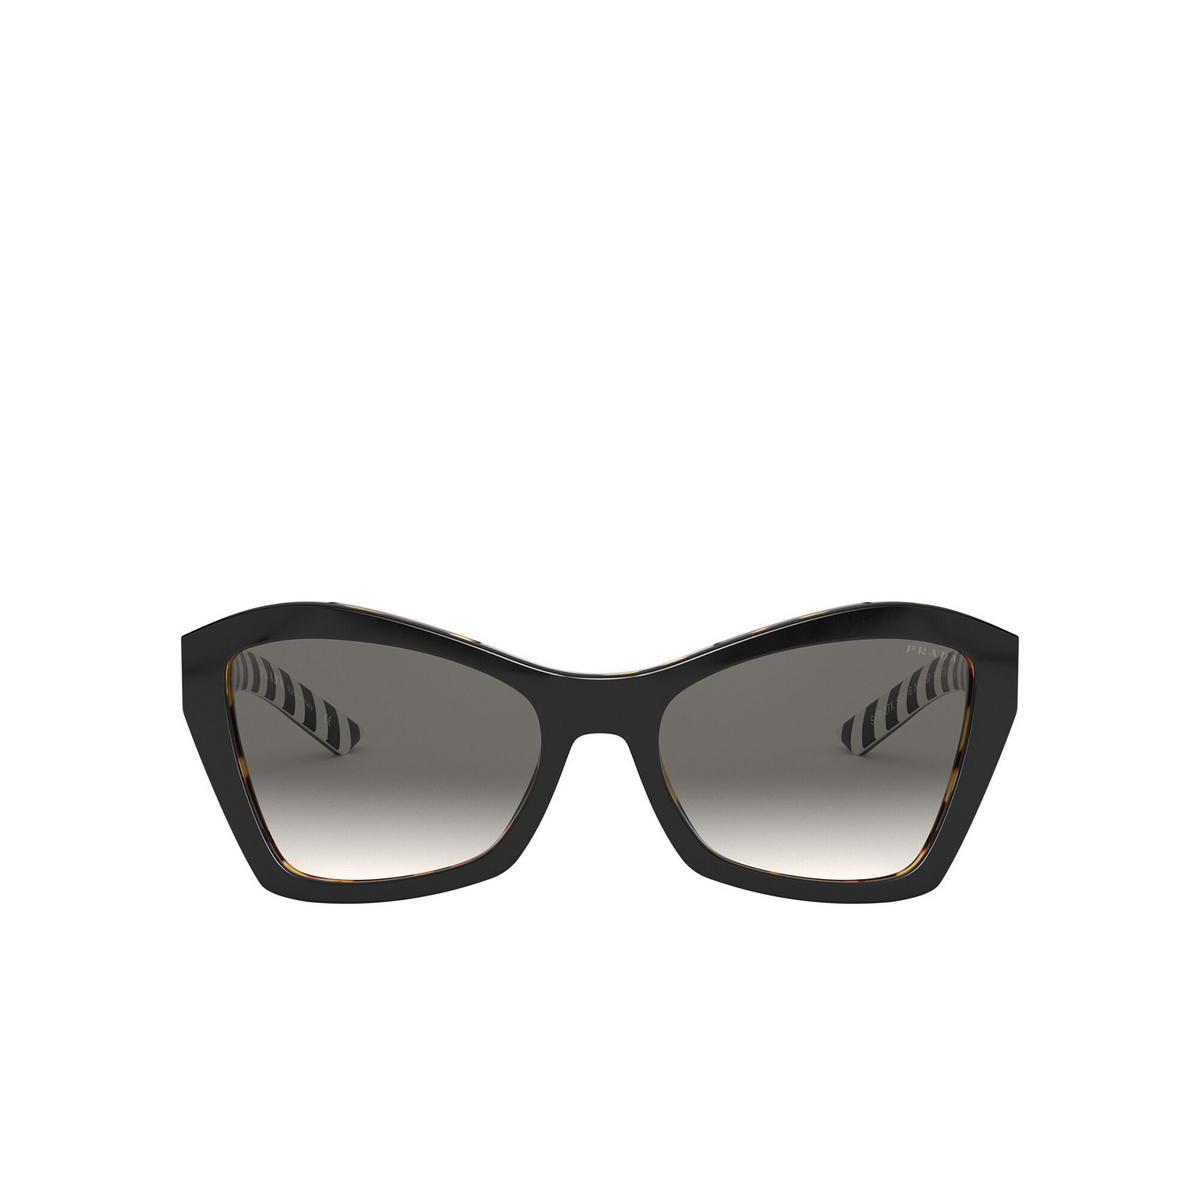 Prada® Butterfly Sunglasses: PR 07XS color Top Black / Medium Havana NAI130 - front view.